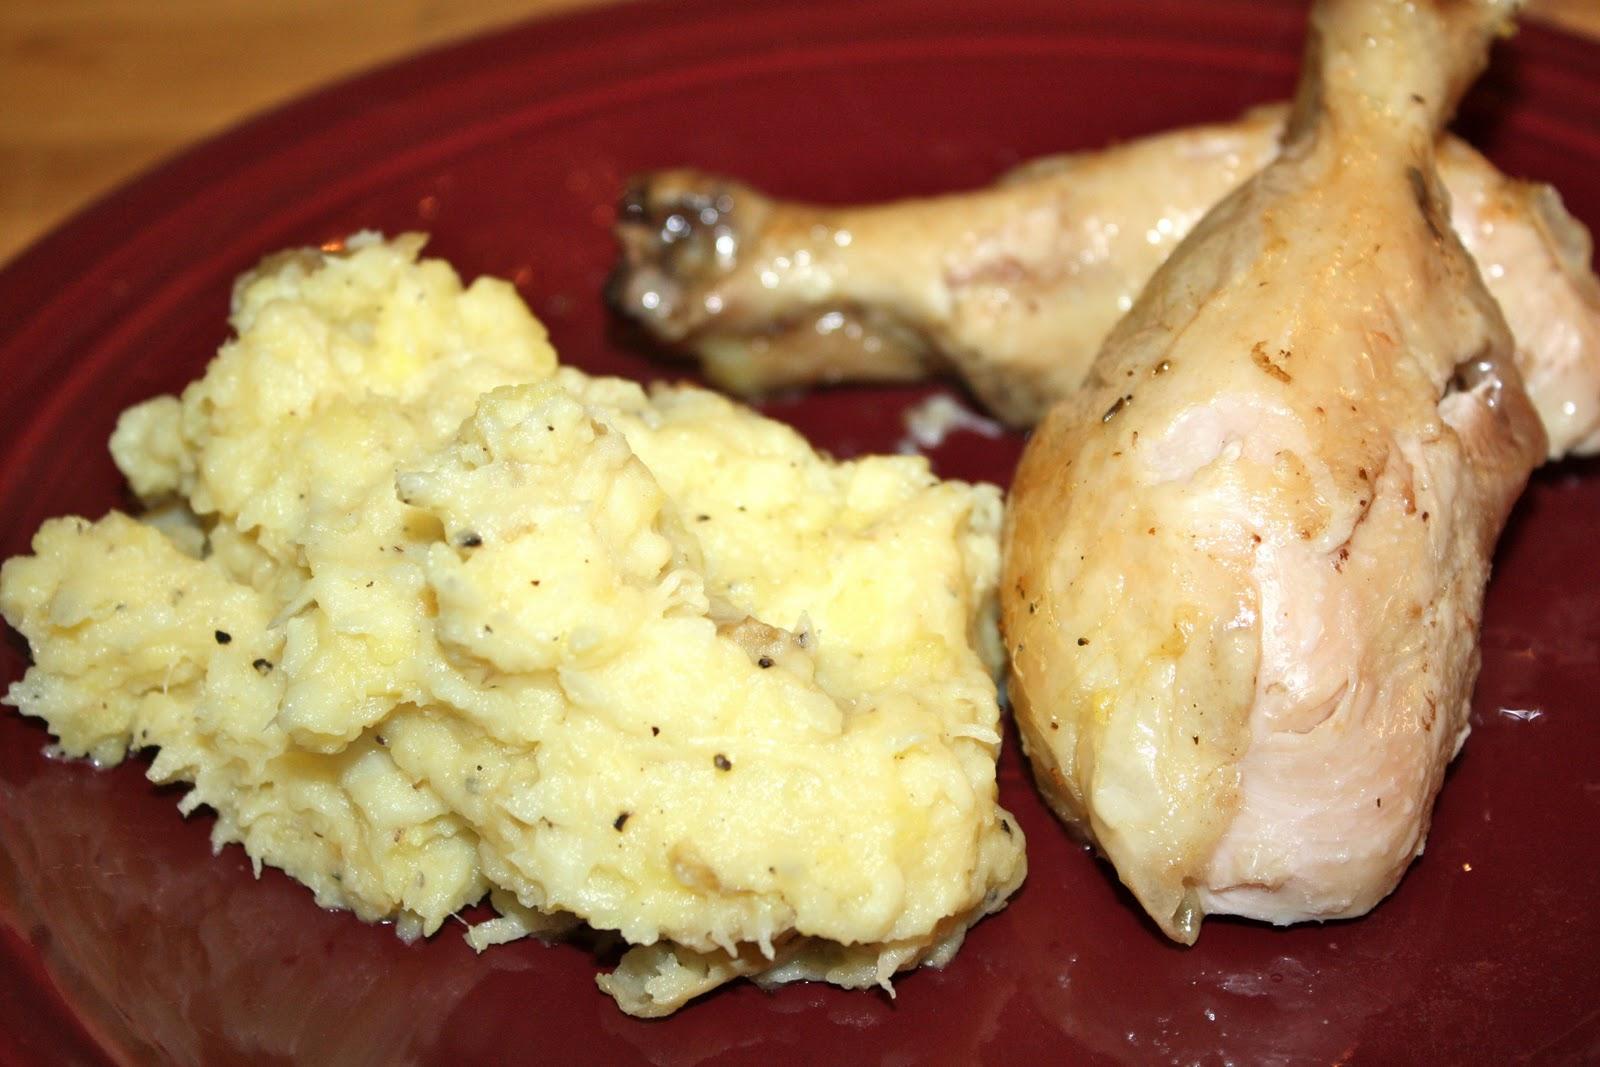 18 Hour Kitchen: Parsnip Mashed Potatoes